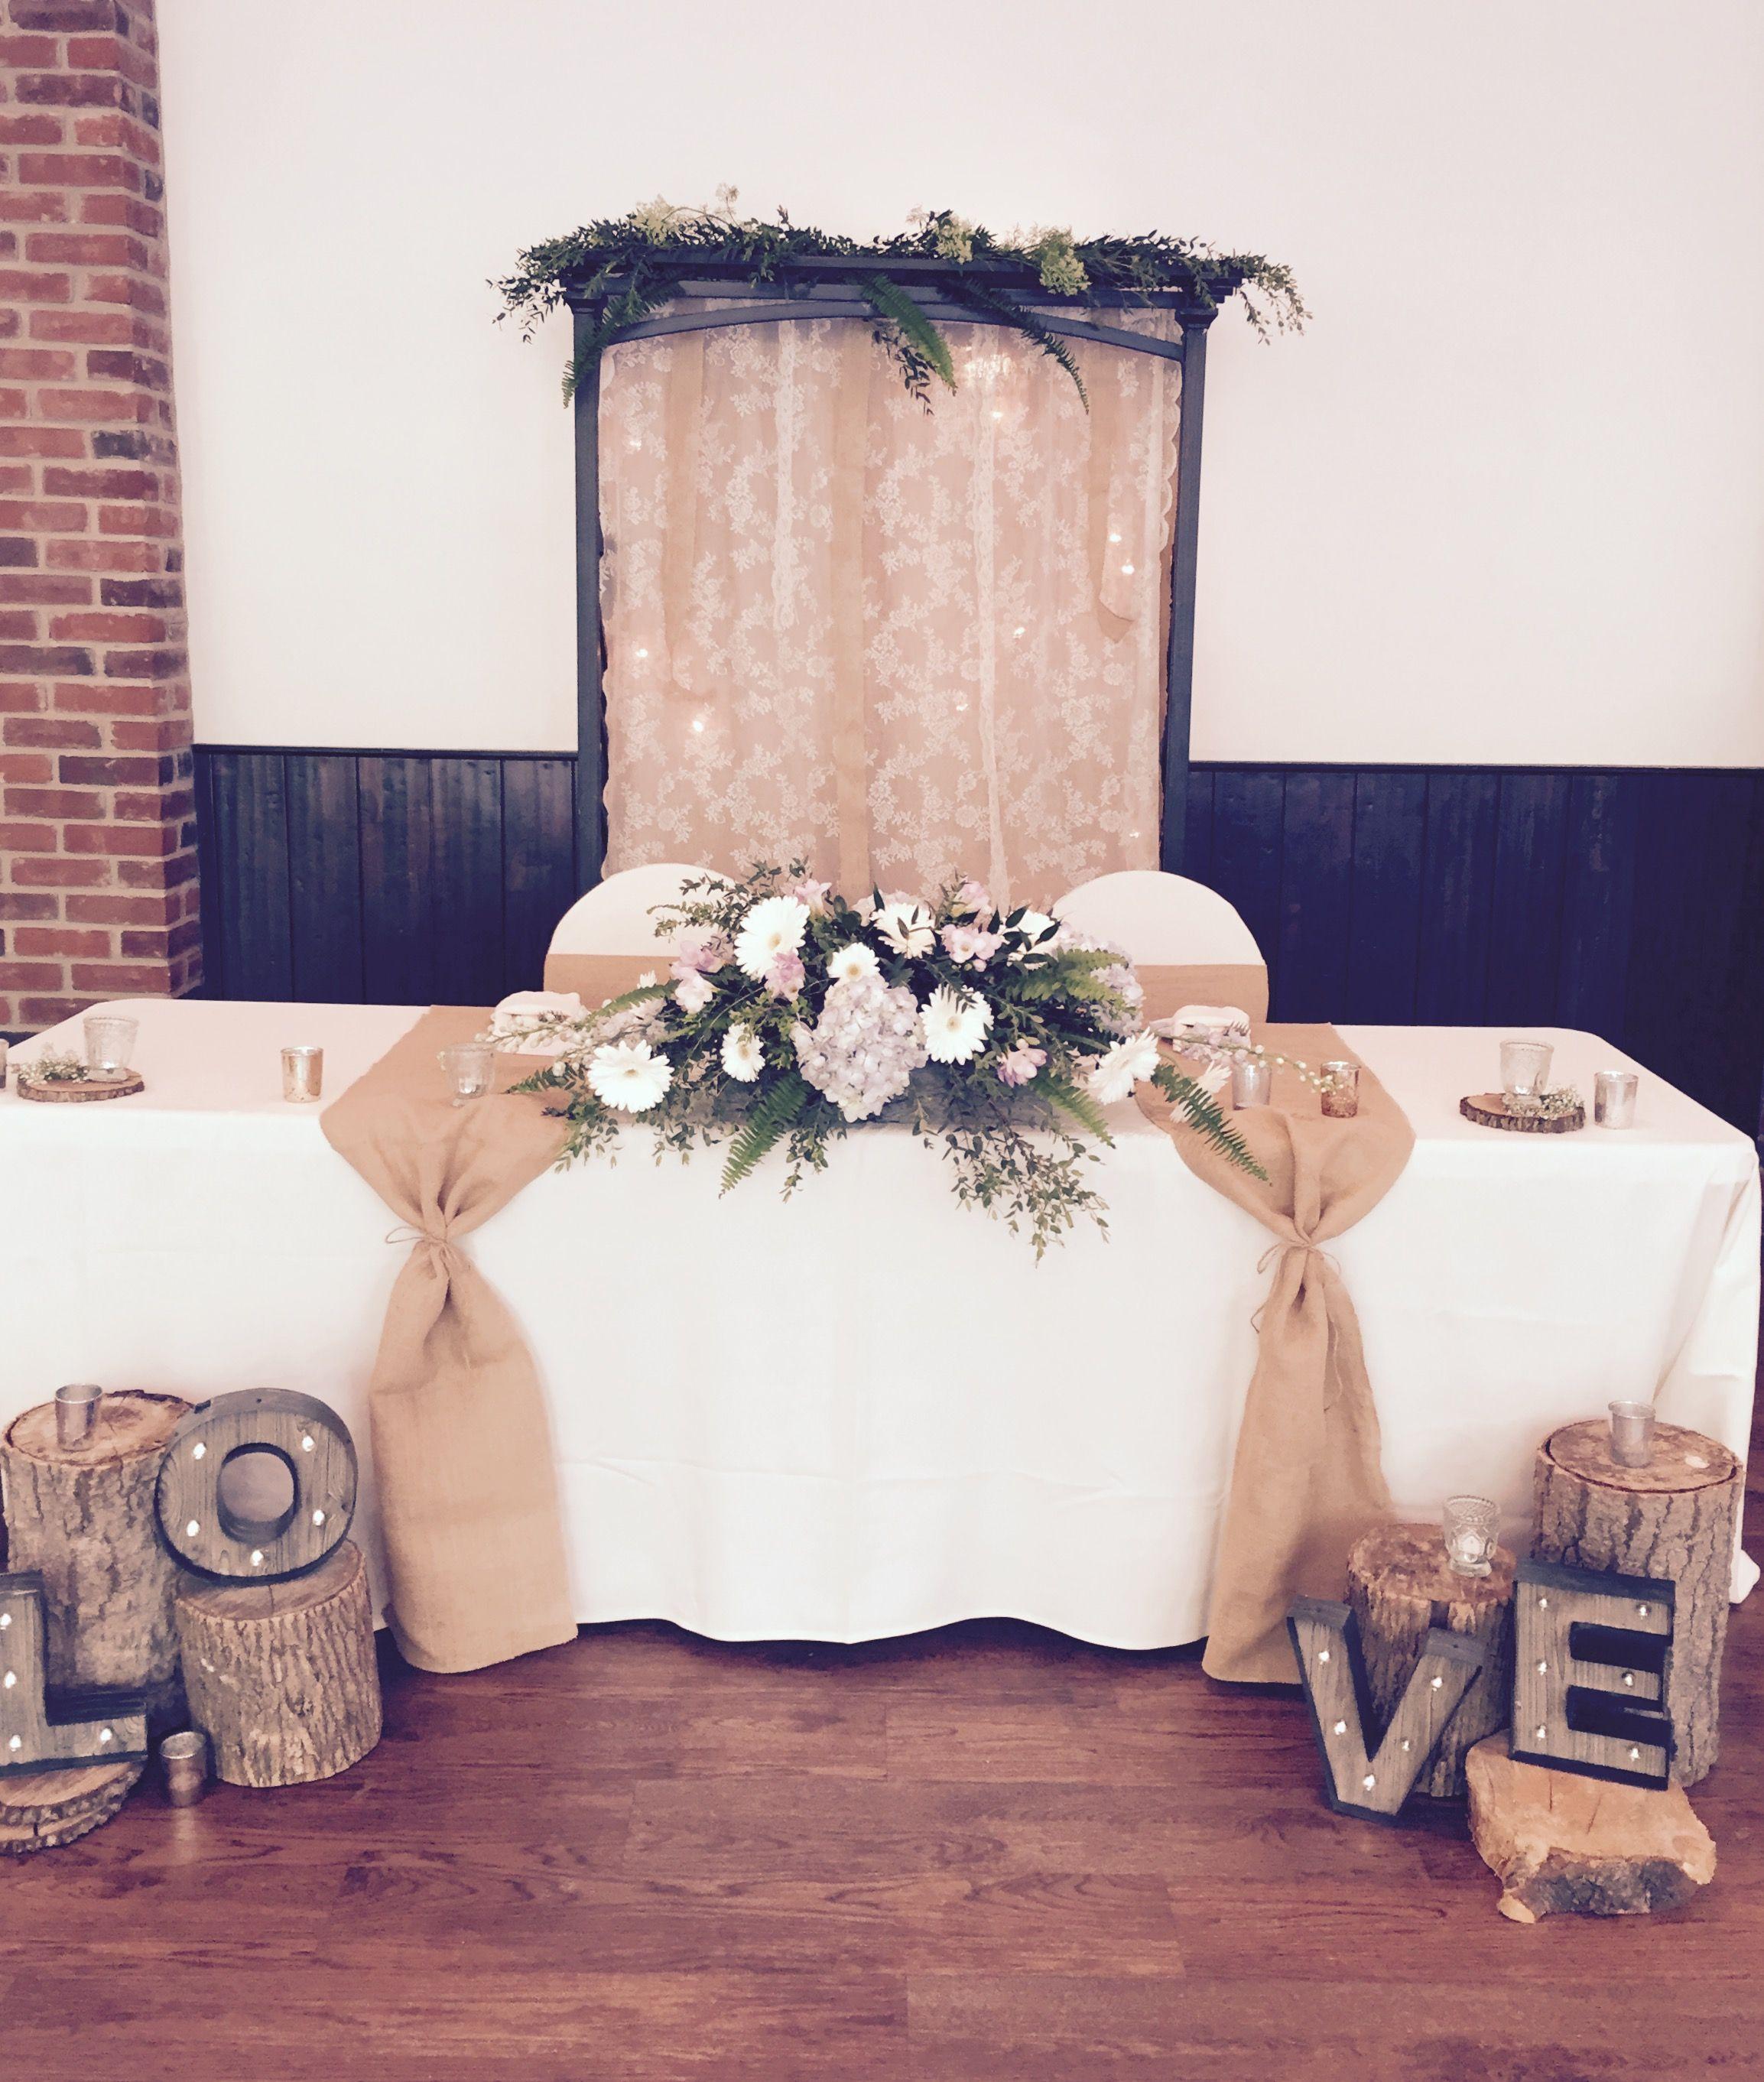 Decorations For Tables Wedding Ideas: Gorgeous Rustic Head Table Wedding At Fantasy Farm